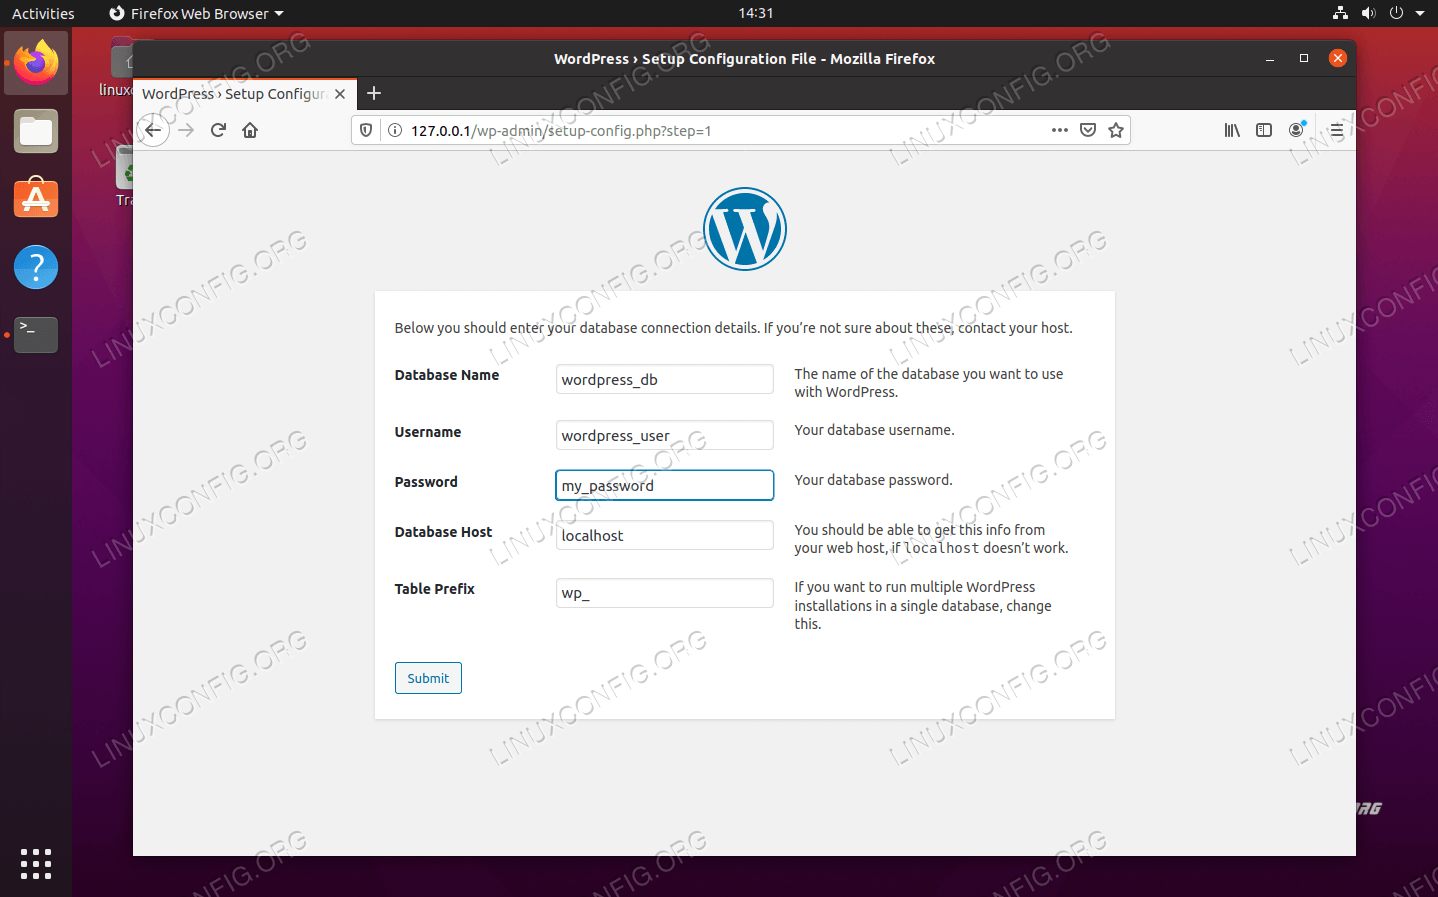 Enter the MySQL database information for WordPress